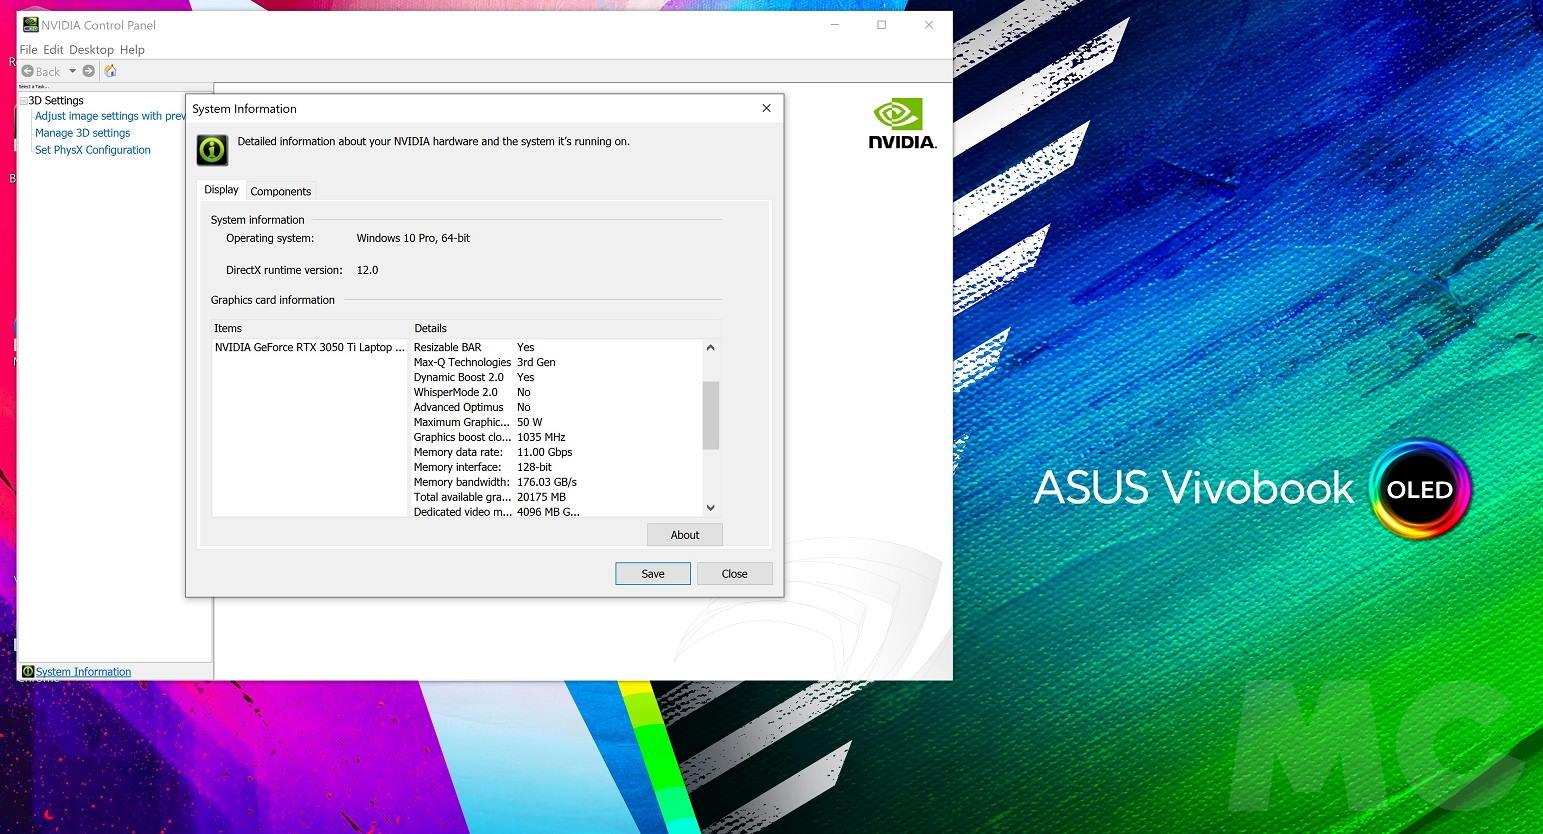 ASUS Vivobook Pro X16 3050 Ti